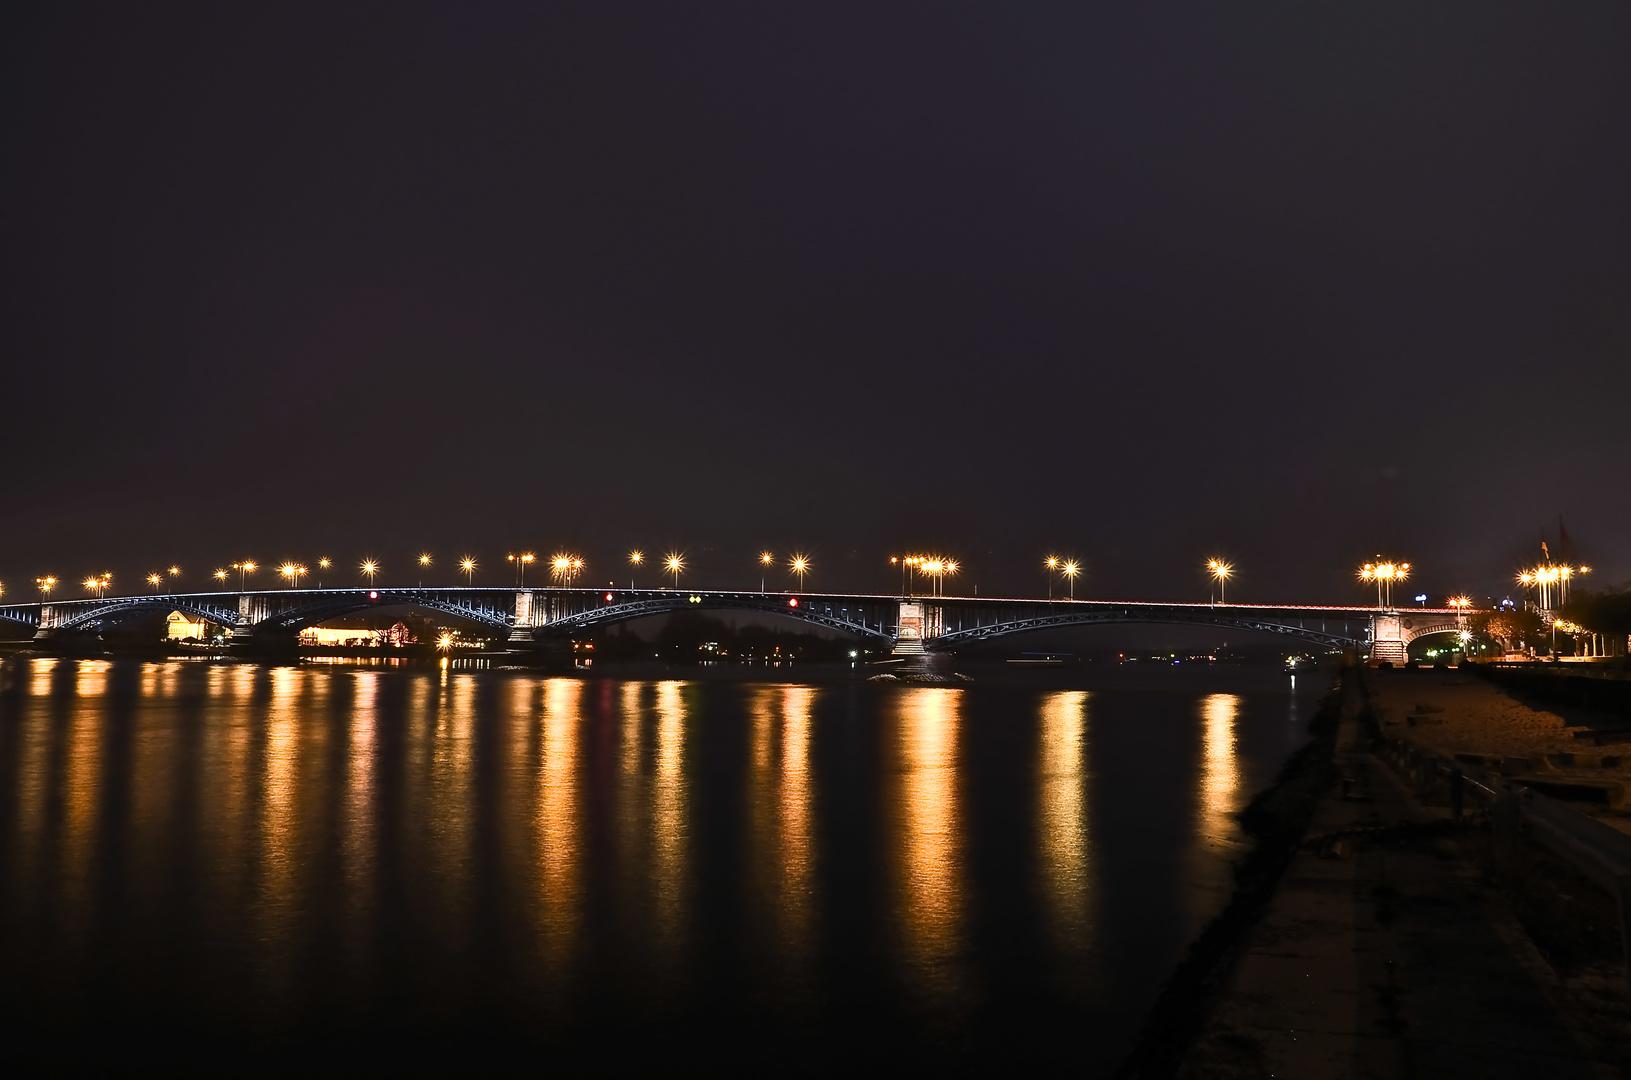 Theodor heuss Brücke in mainz bei Nacht